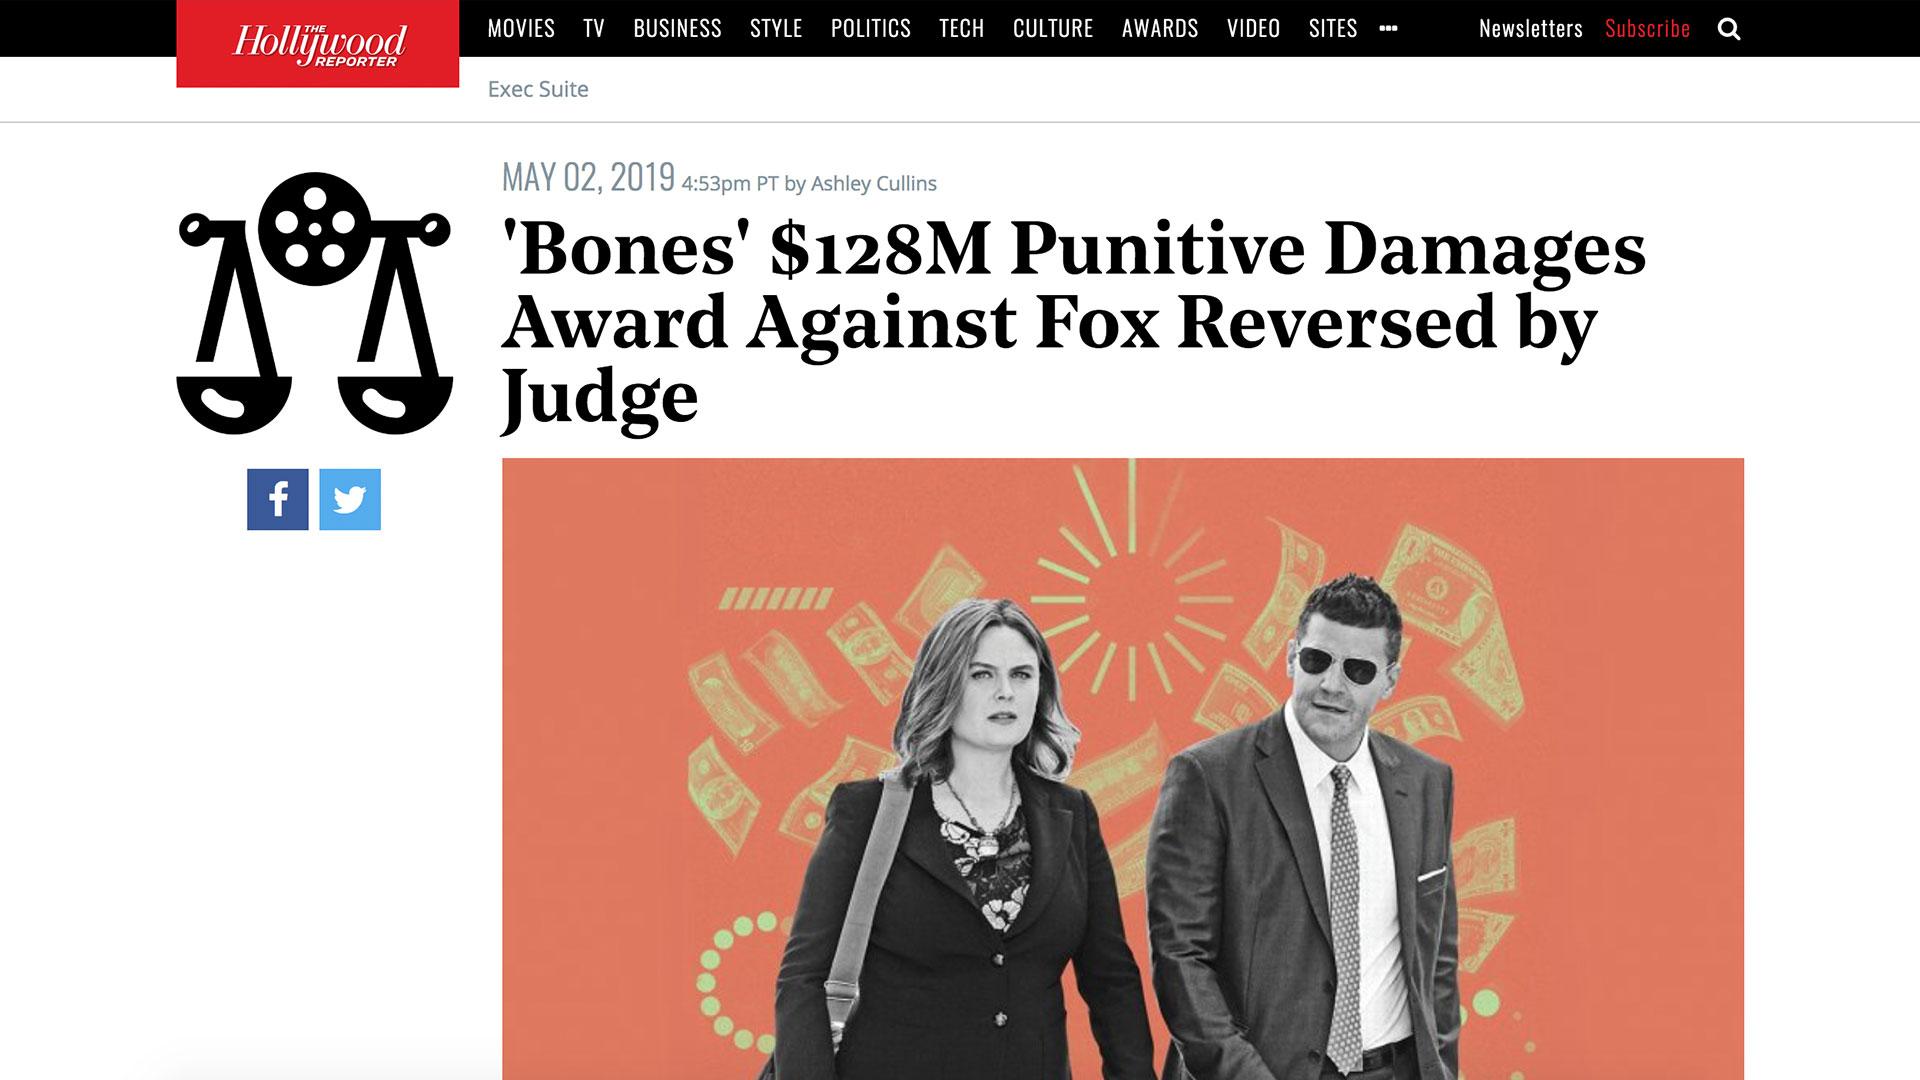 Fairness Rocks News 'Bones' $128M Punitive Damages Award Against Fox Reversed by Judge